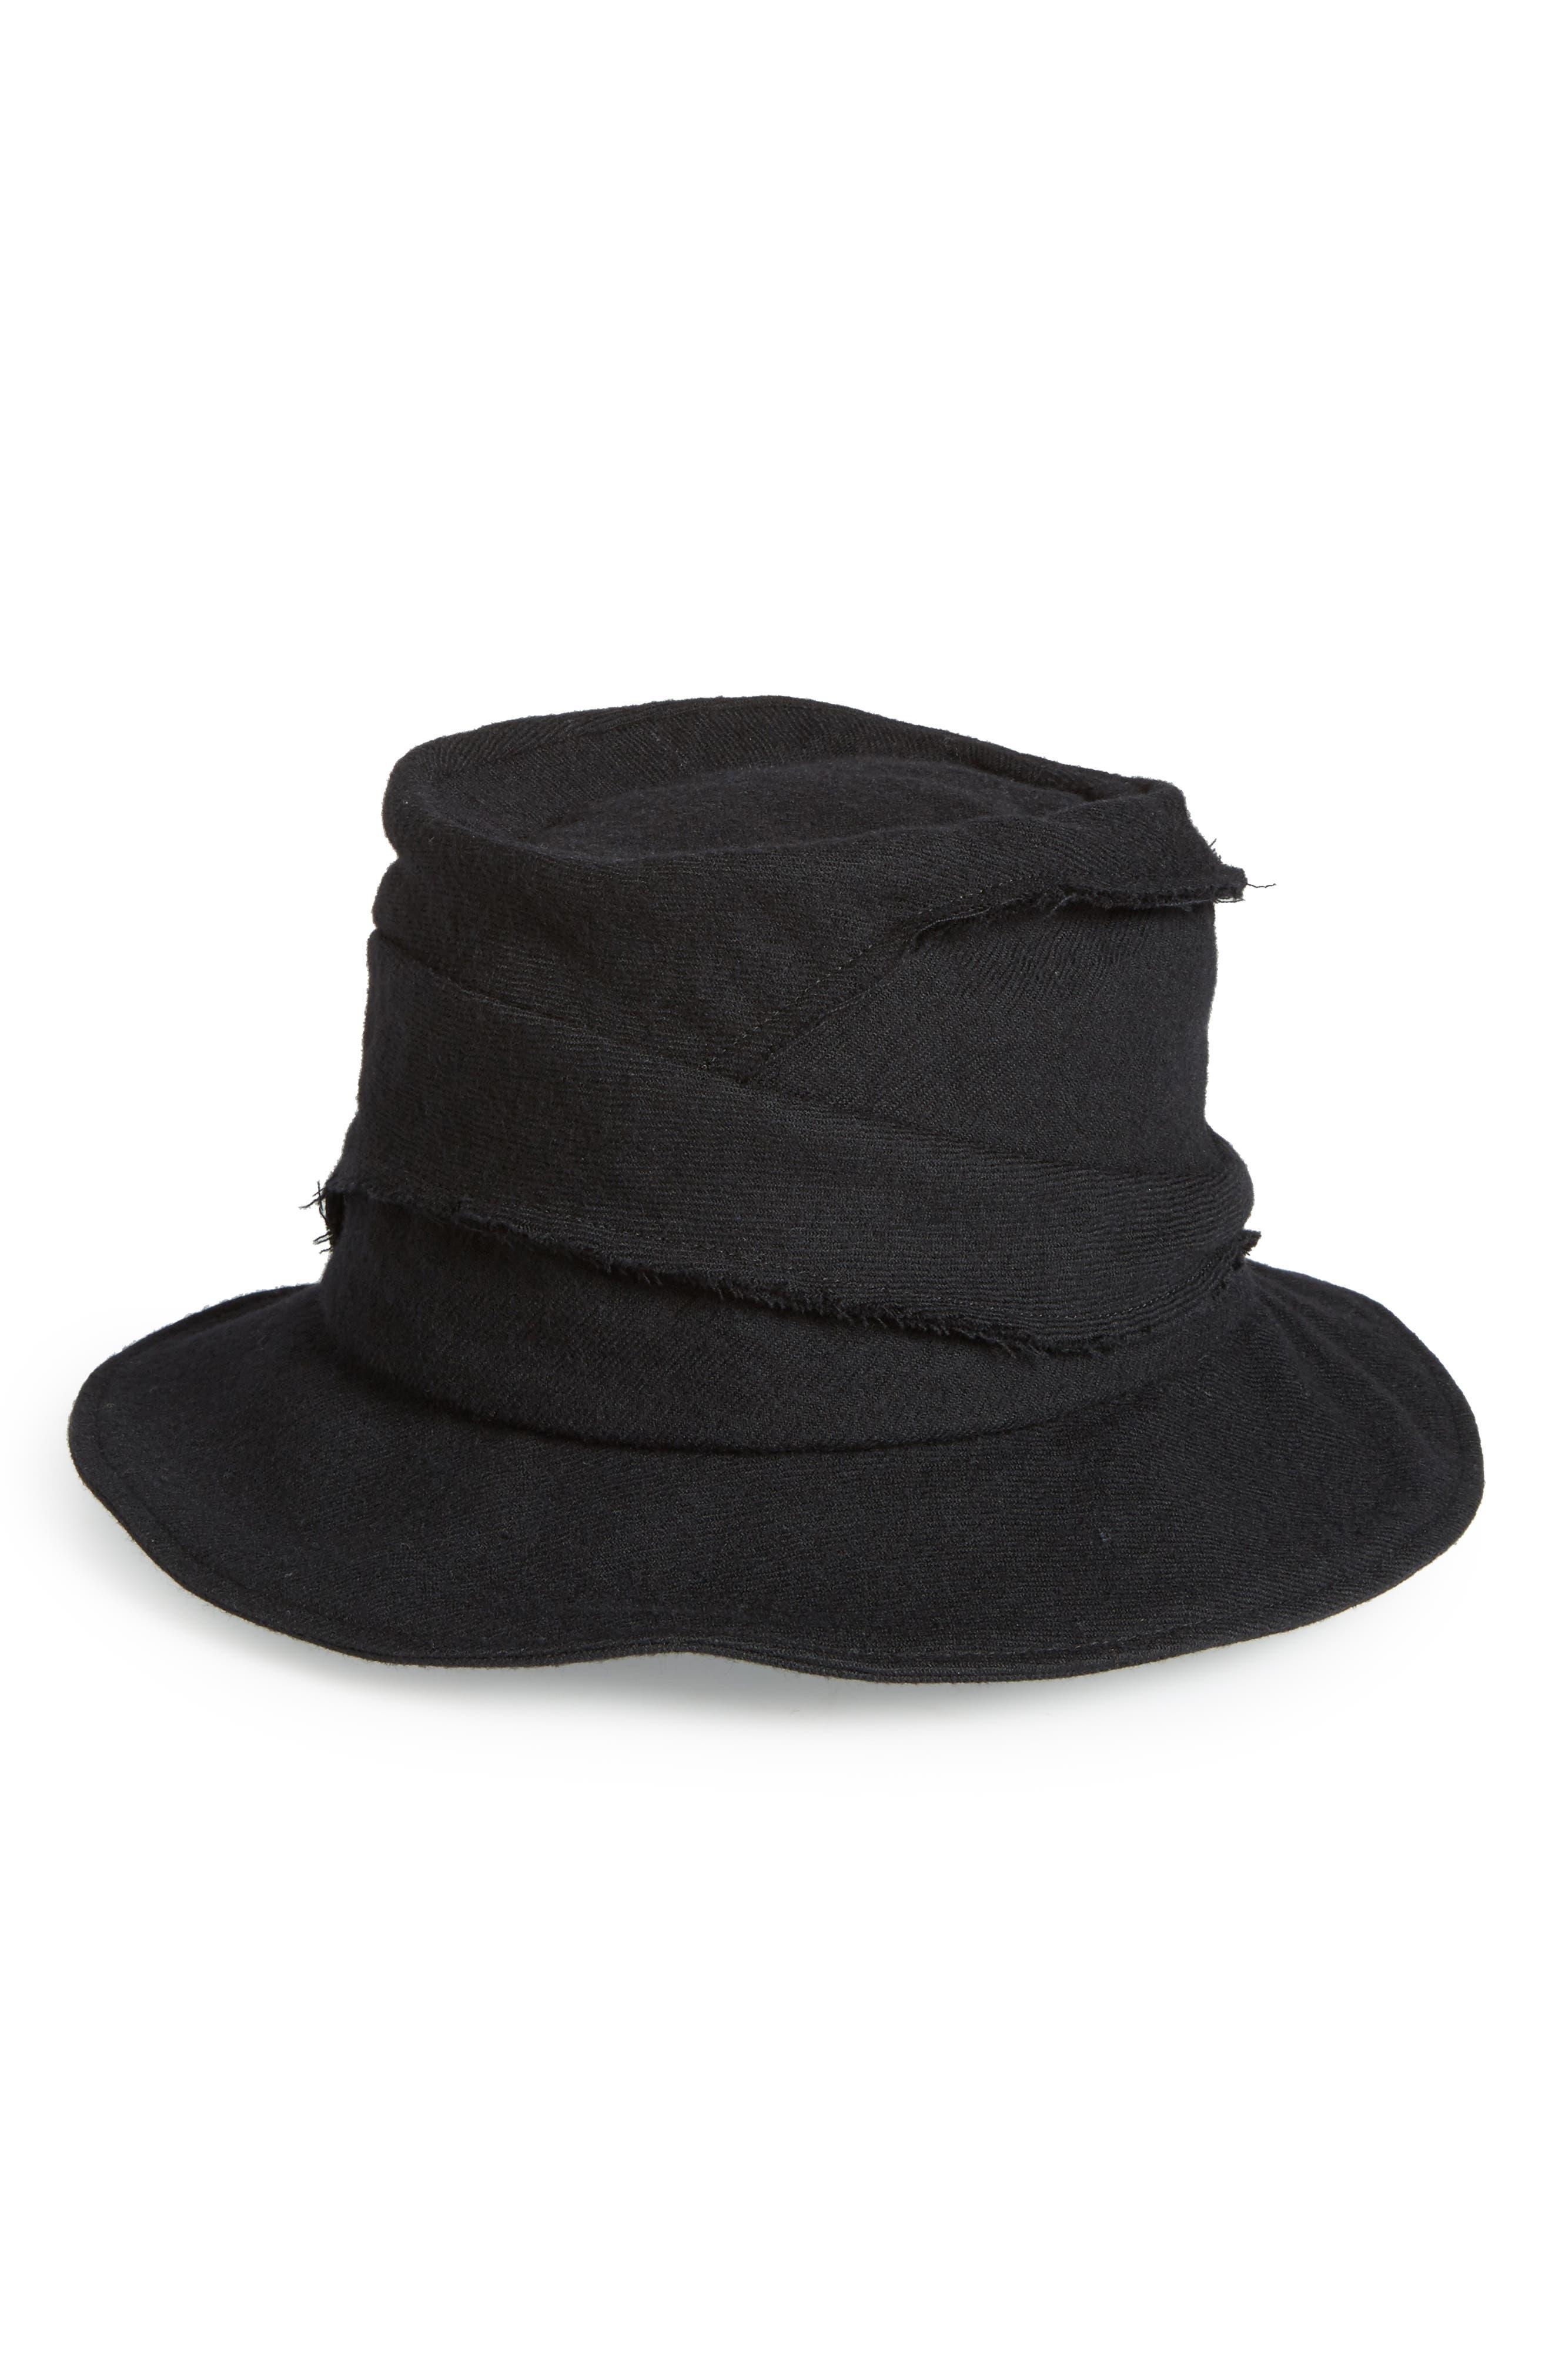 Main Image - Y's by Yohji Yamamoto Layered Wool Hat